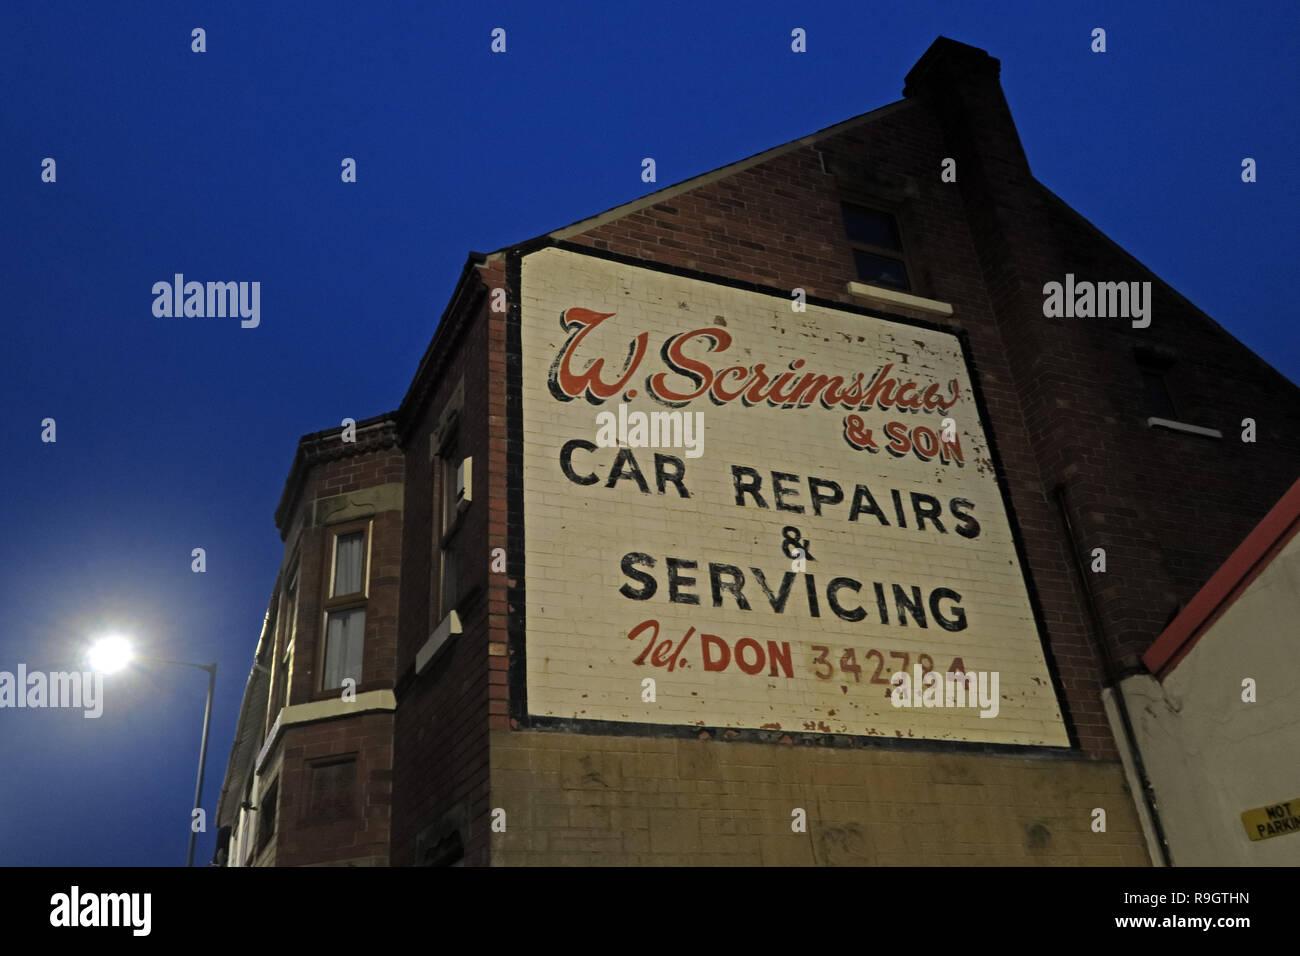 GoTonySmith,@HotpixUK,HotpixUK,night,sign,painted,on,gable-end,gableend,moon,dusk,Car Repairs and Servicing,Don 342784,Balby Rd,Doncaster,South Yorkshire,England,UK,Car Repairs,Servicing,Doncaster 342784,Yorkshire,DN4 0RE,DN4,at dusk,advertising,342784,terrace,MOT Service Centre,MOT,Don,01302342784,Hexthorpe,motor mechanics,motor engineers,automobile,transport,mechanics